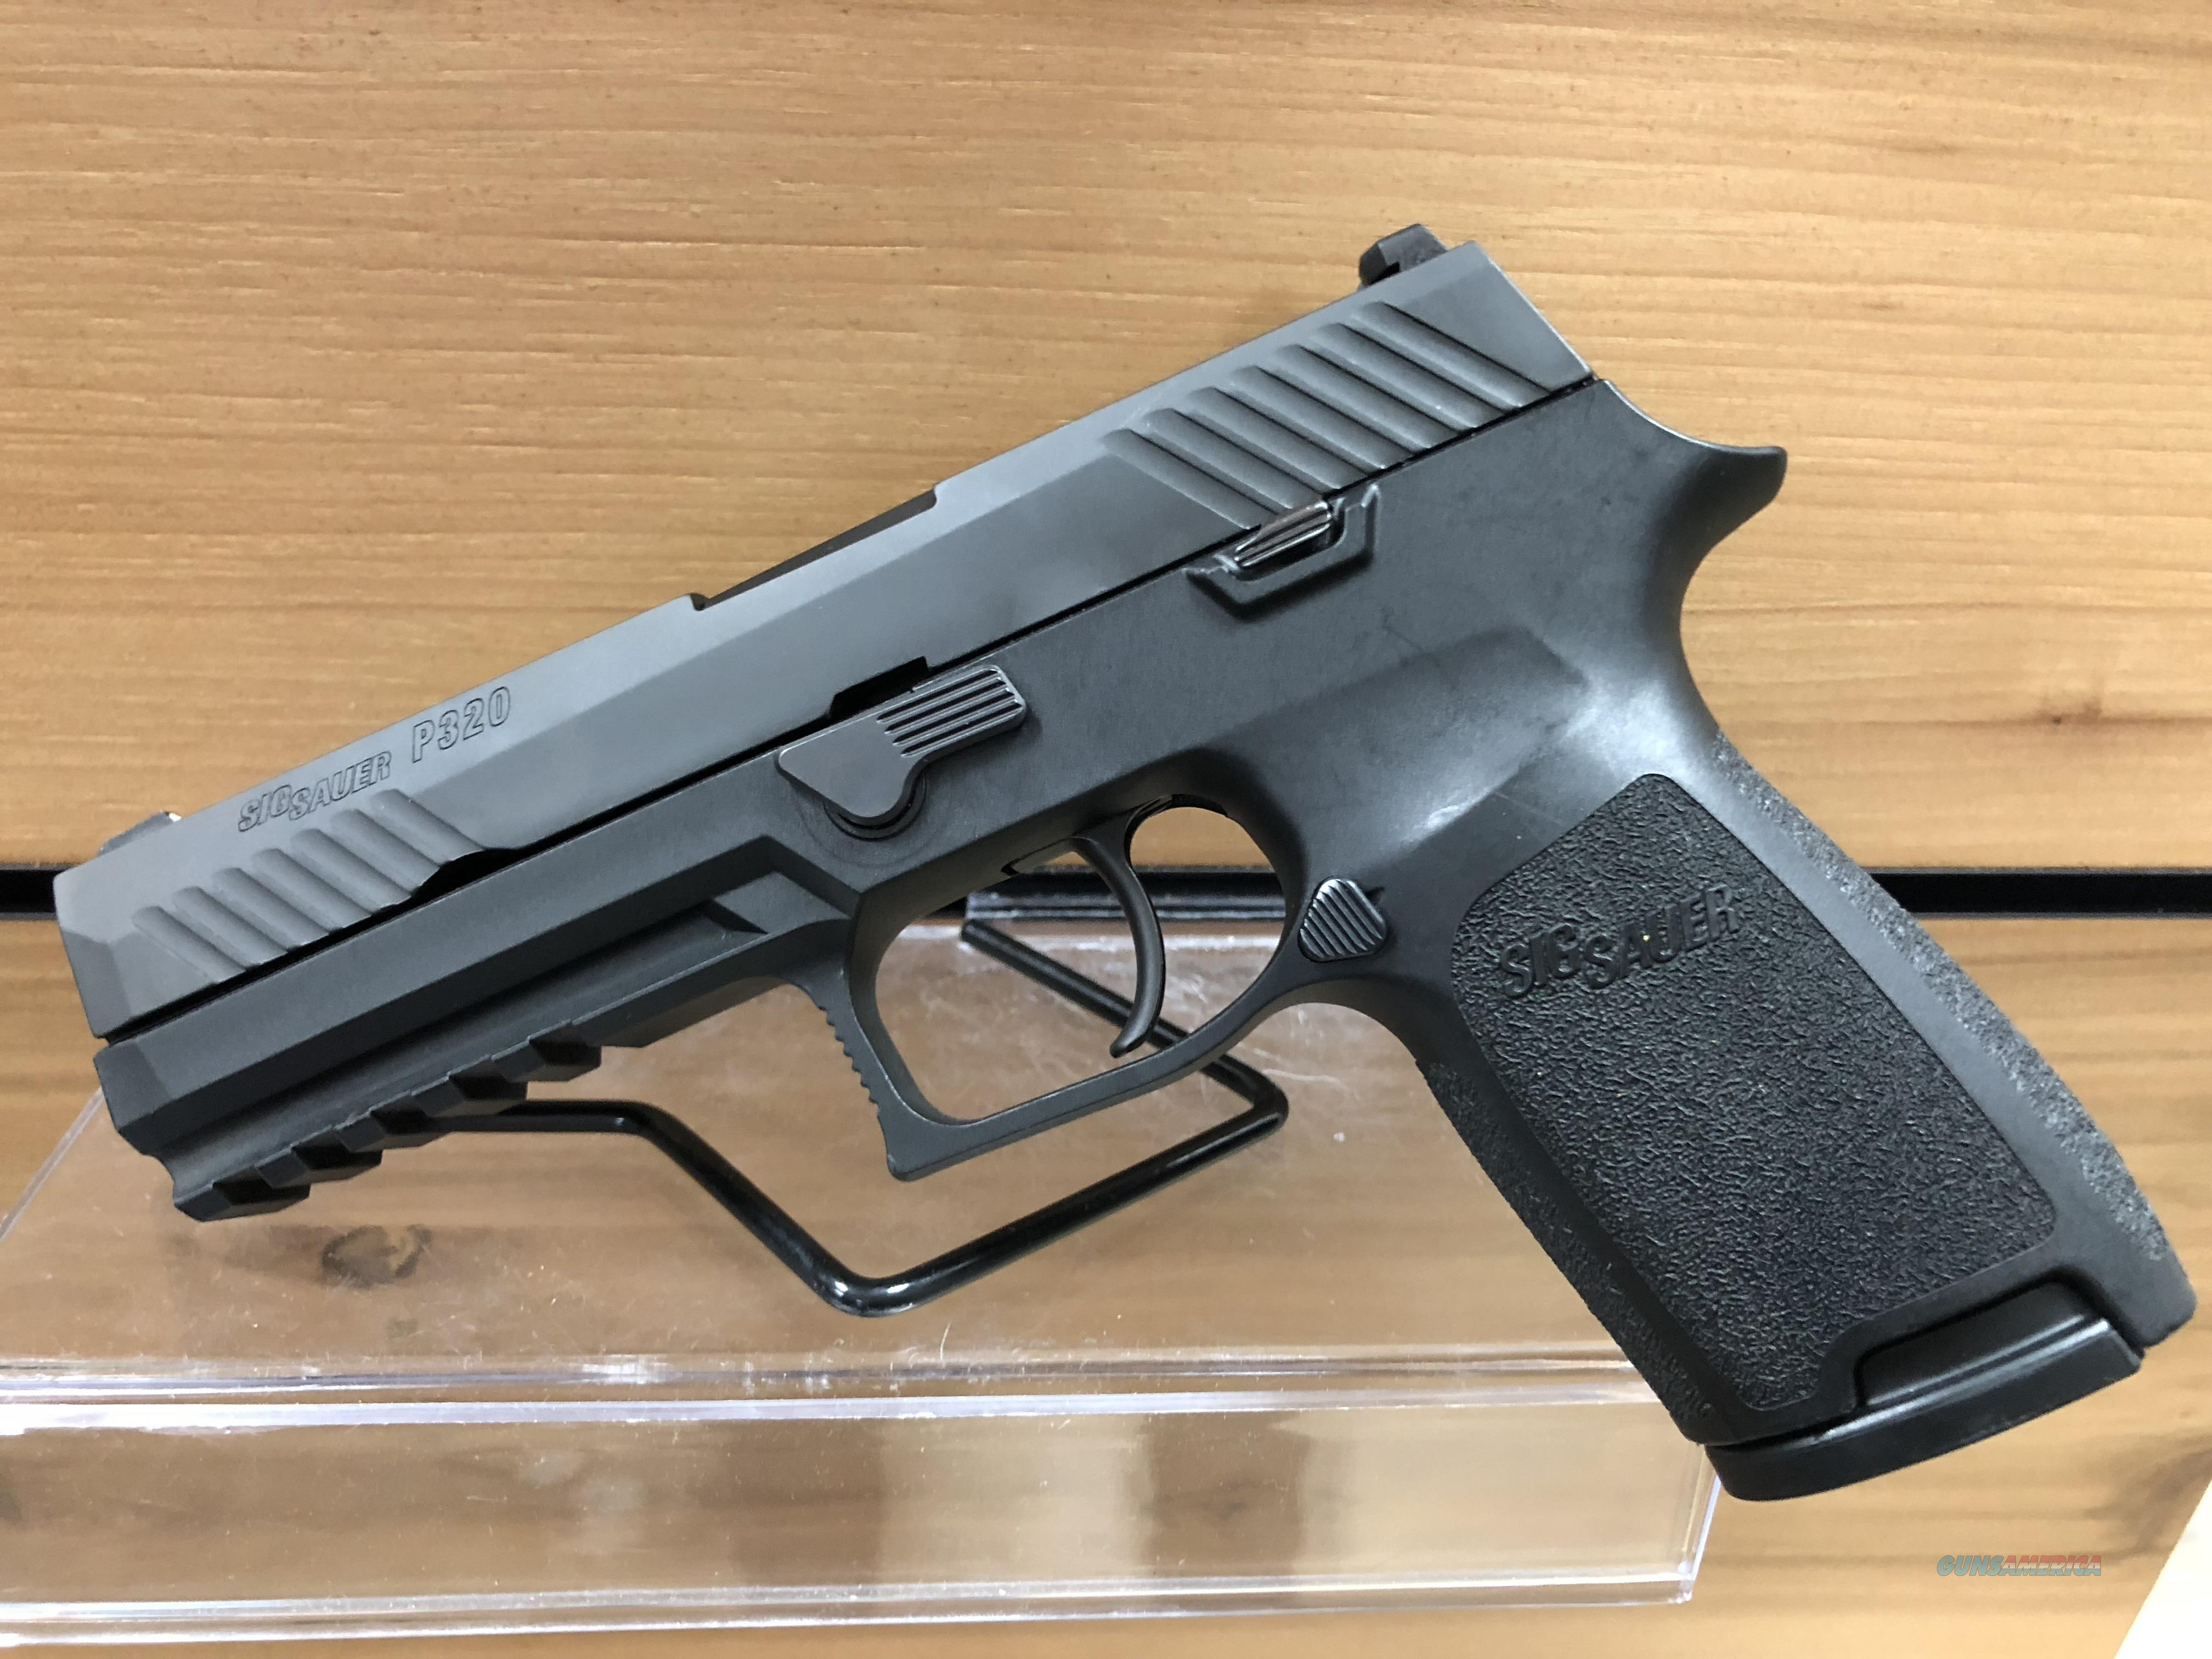 USED SIG P320F, 45ACP  Guns > Pistols > Sig - Sauer/Sigarms Pistols > P320